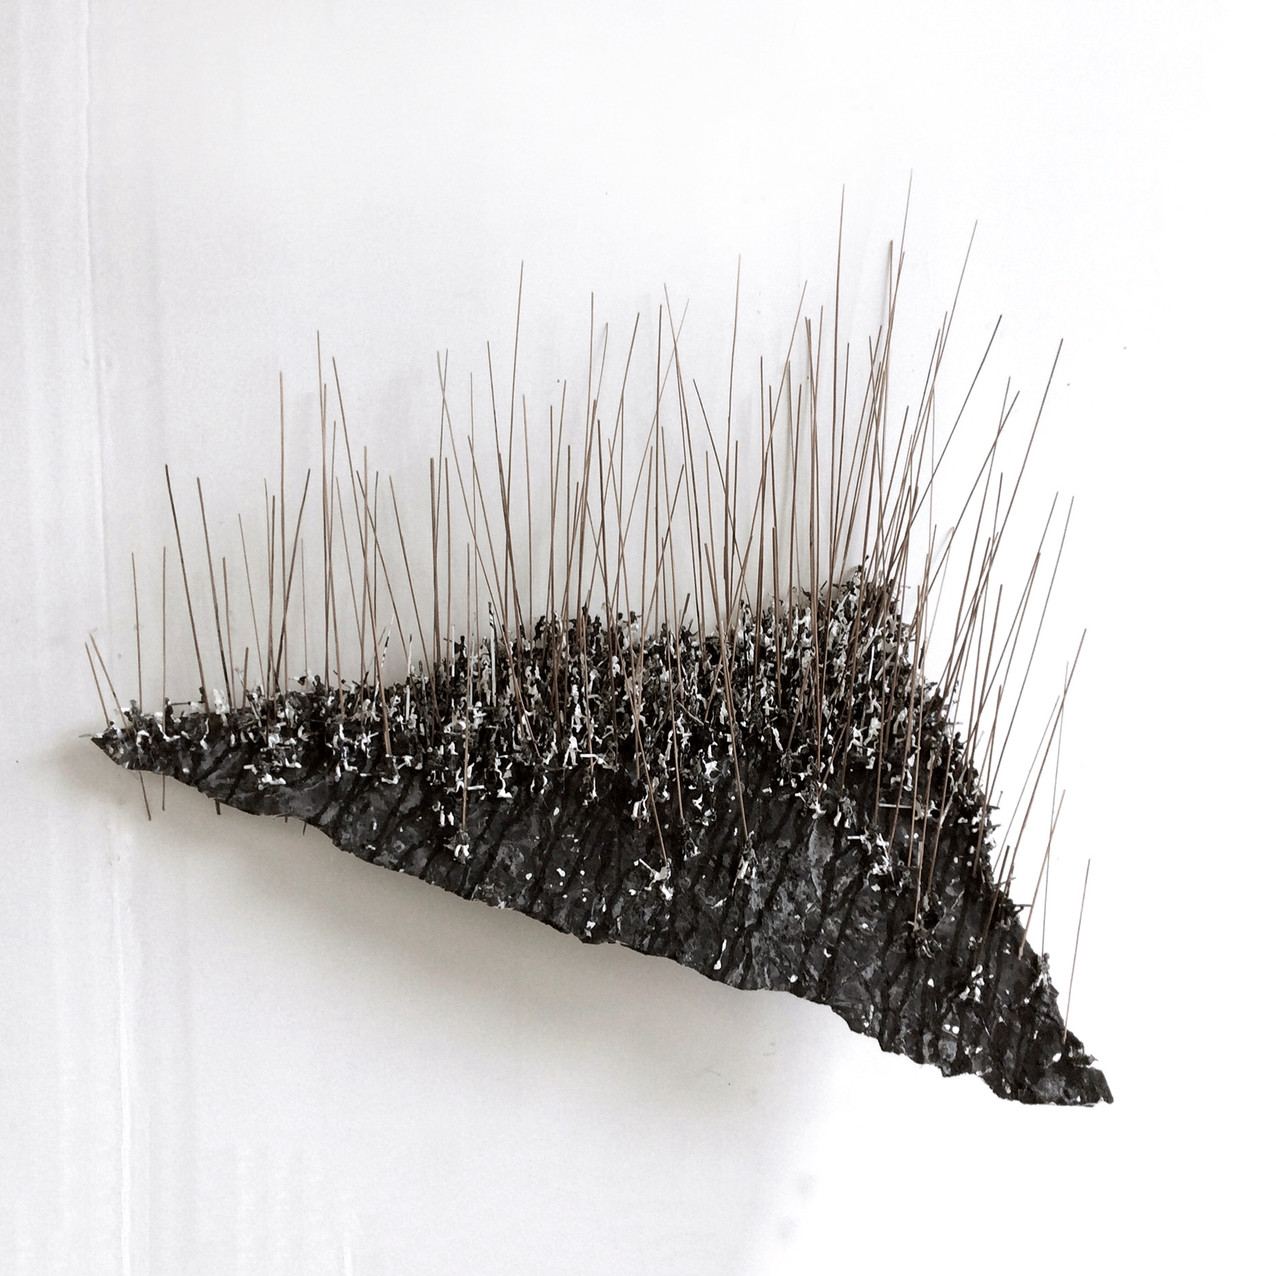 Lose Hill 2018, foam board, straw, plastic figure and acrlyic, 70x90x30cm